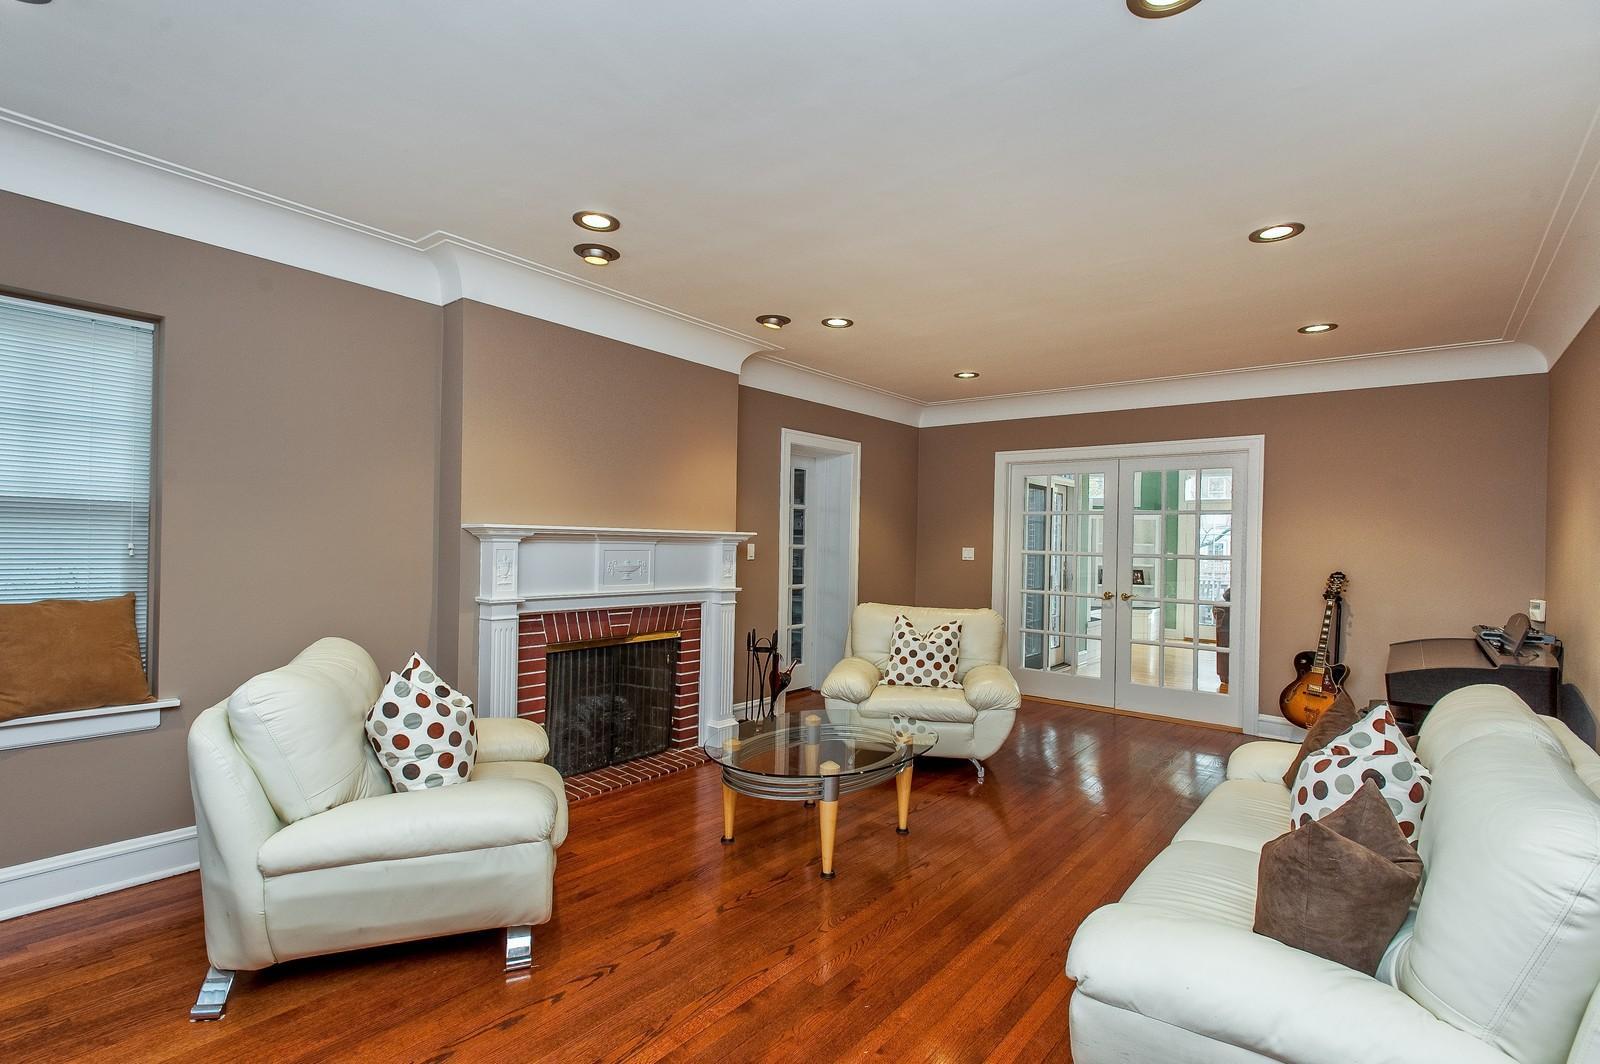 Real Estate Photography - 556 Winnetka Ave, Winnetka, IL, 60093 - Living Room